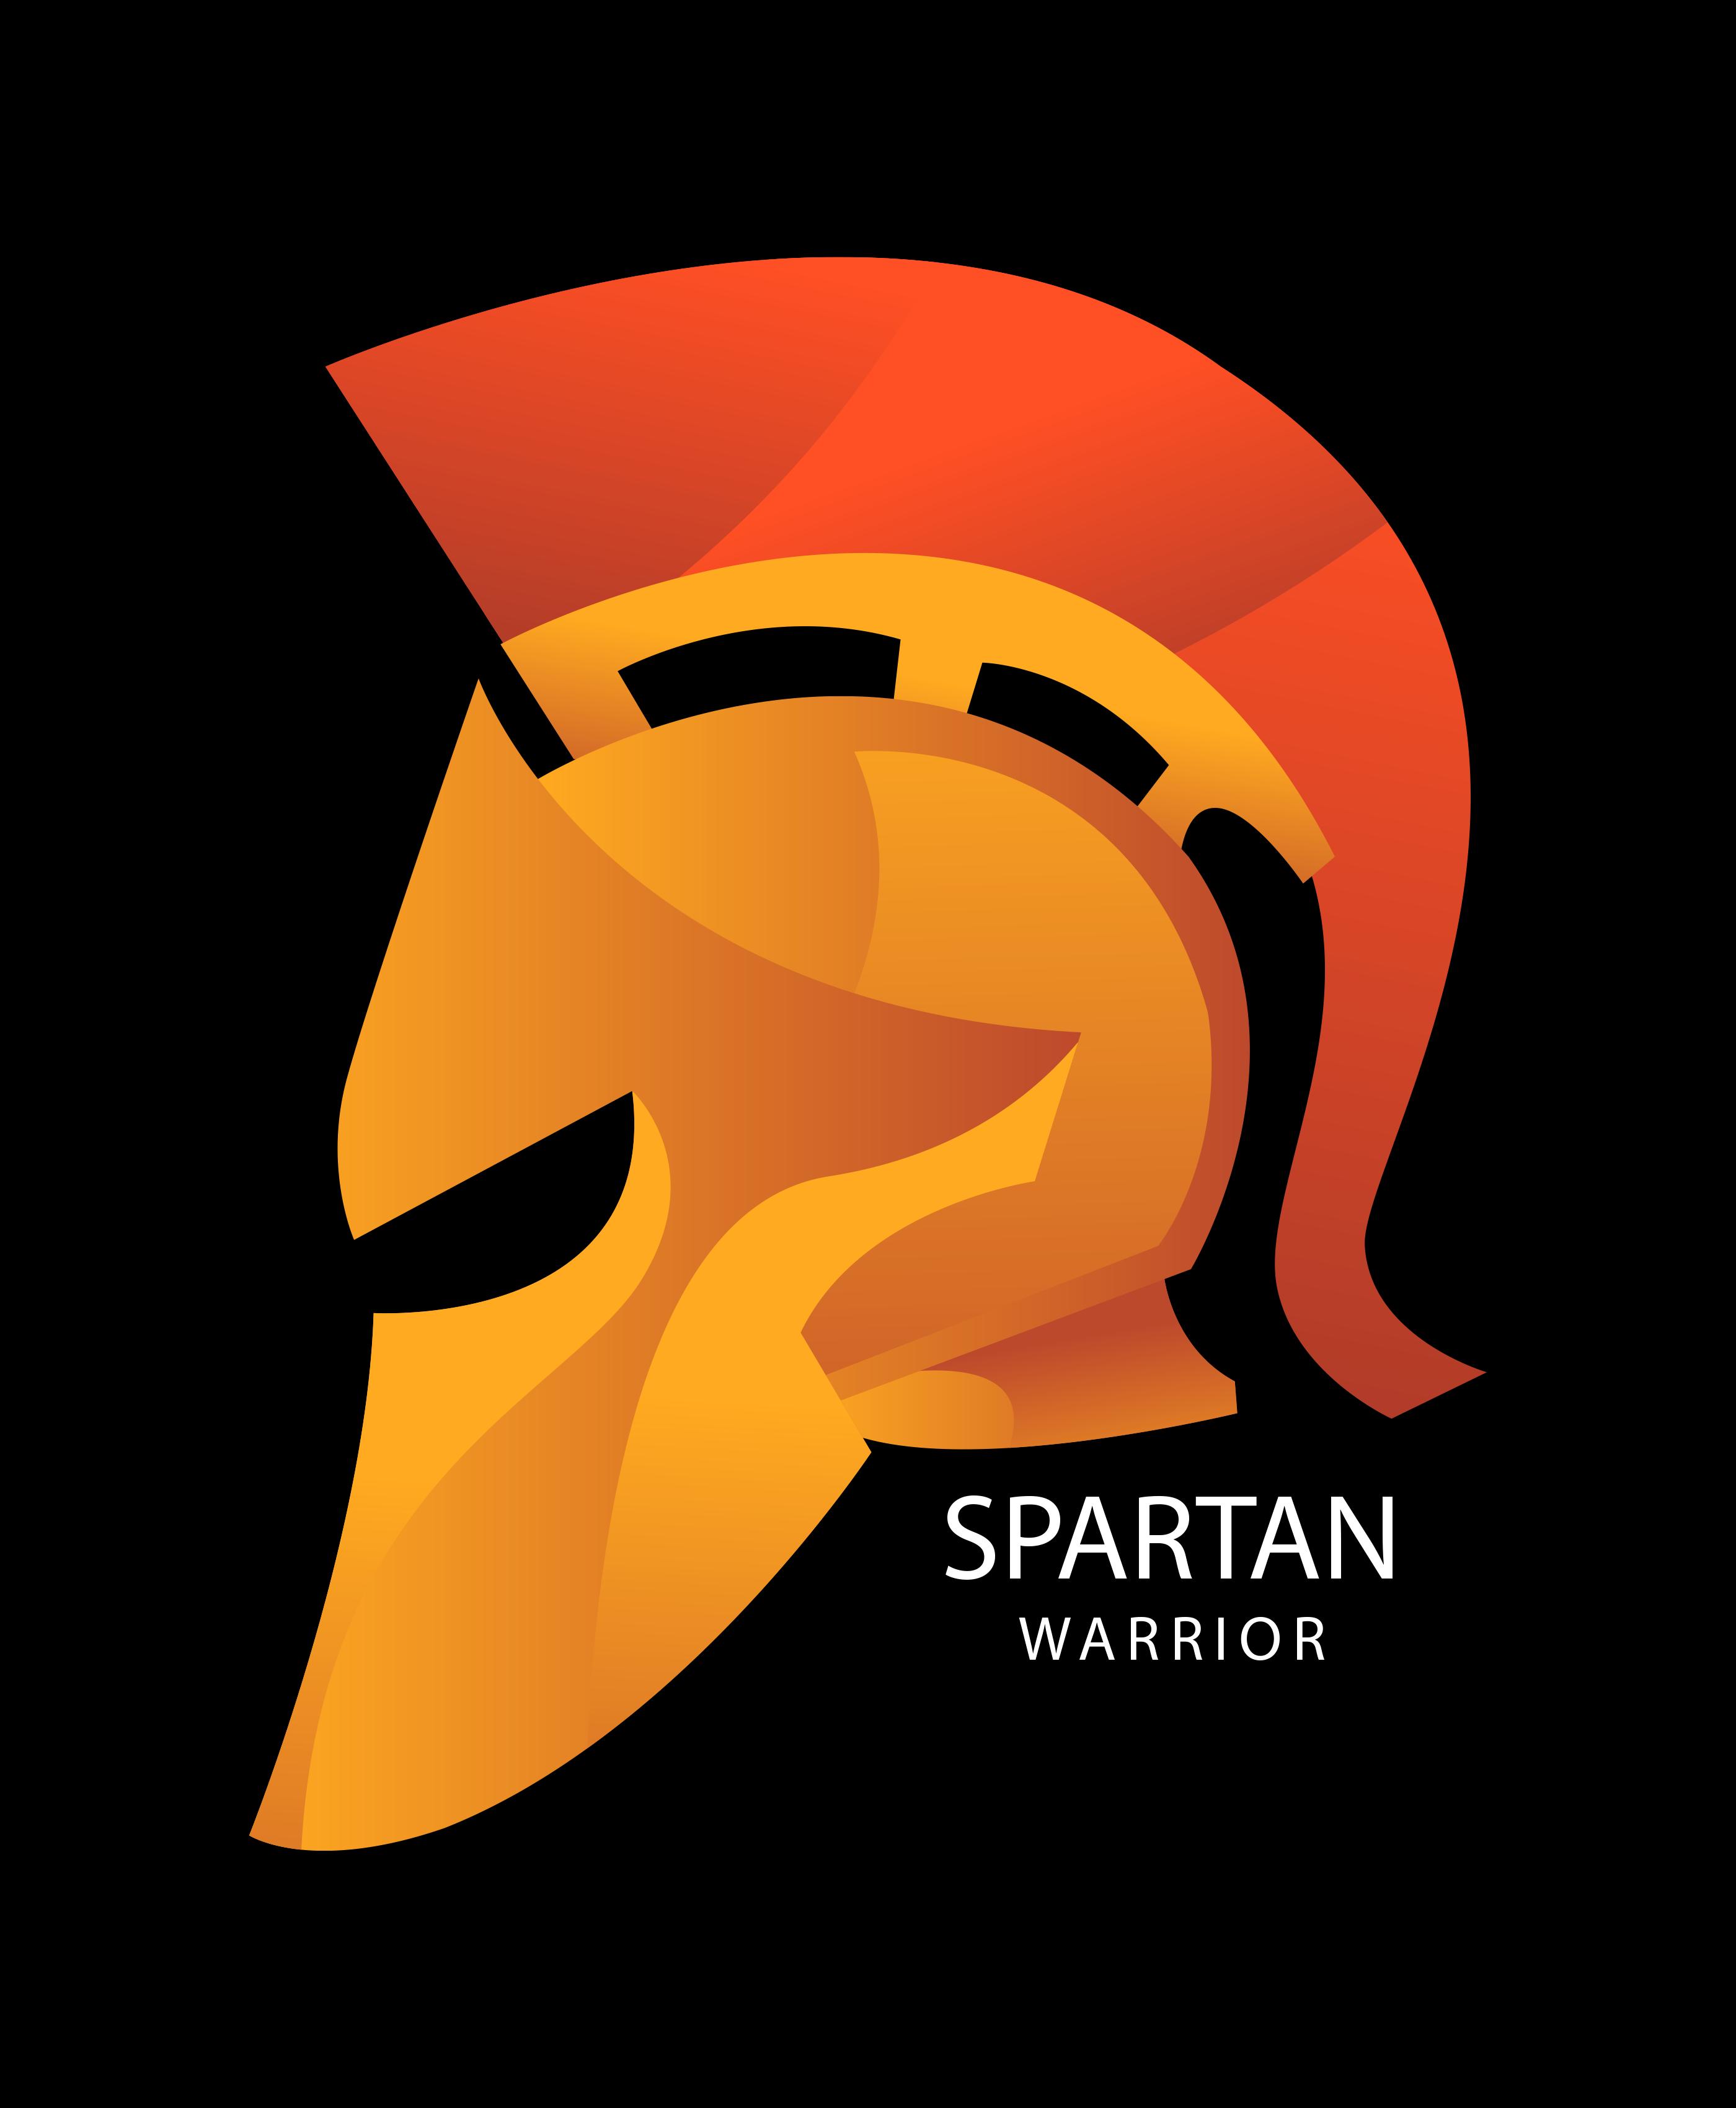 Spartan Helmet Spartan Helmet Helmet Spartan